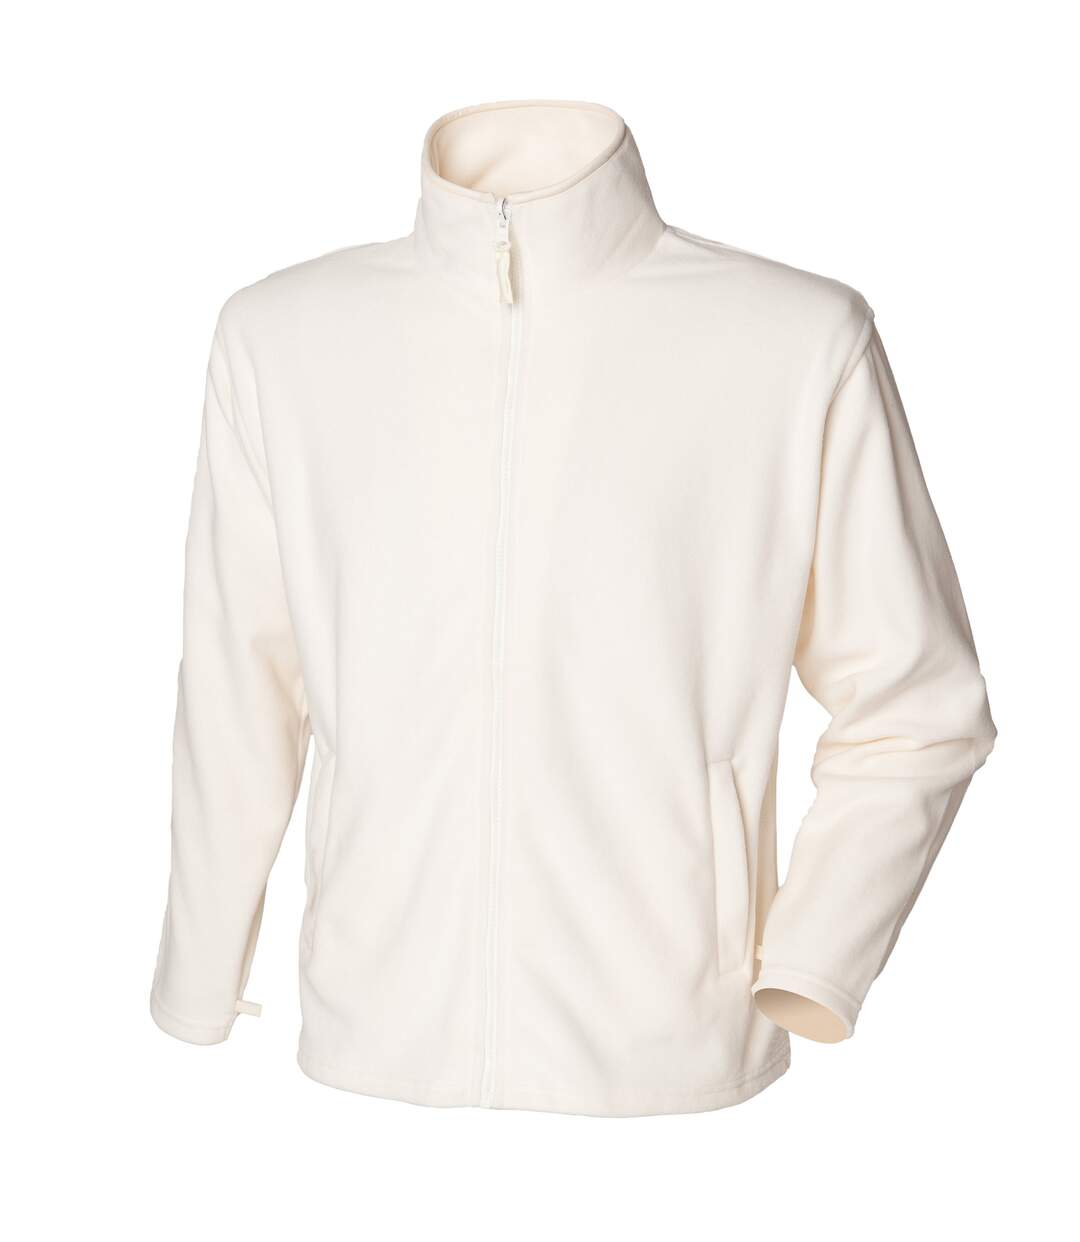 Henbury Mens Microfleece Anti-Pill Jacket (Cream) - UTRW678